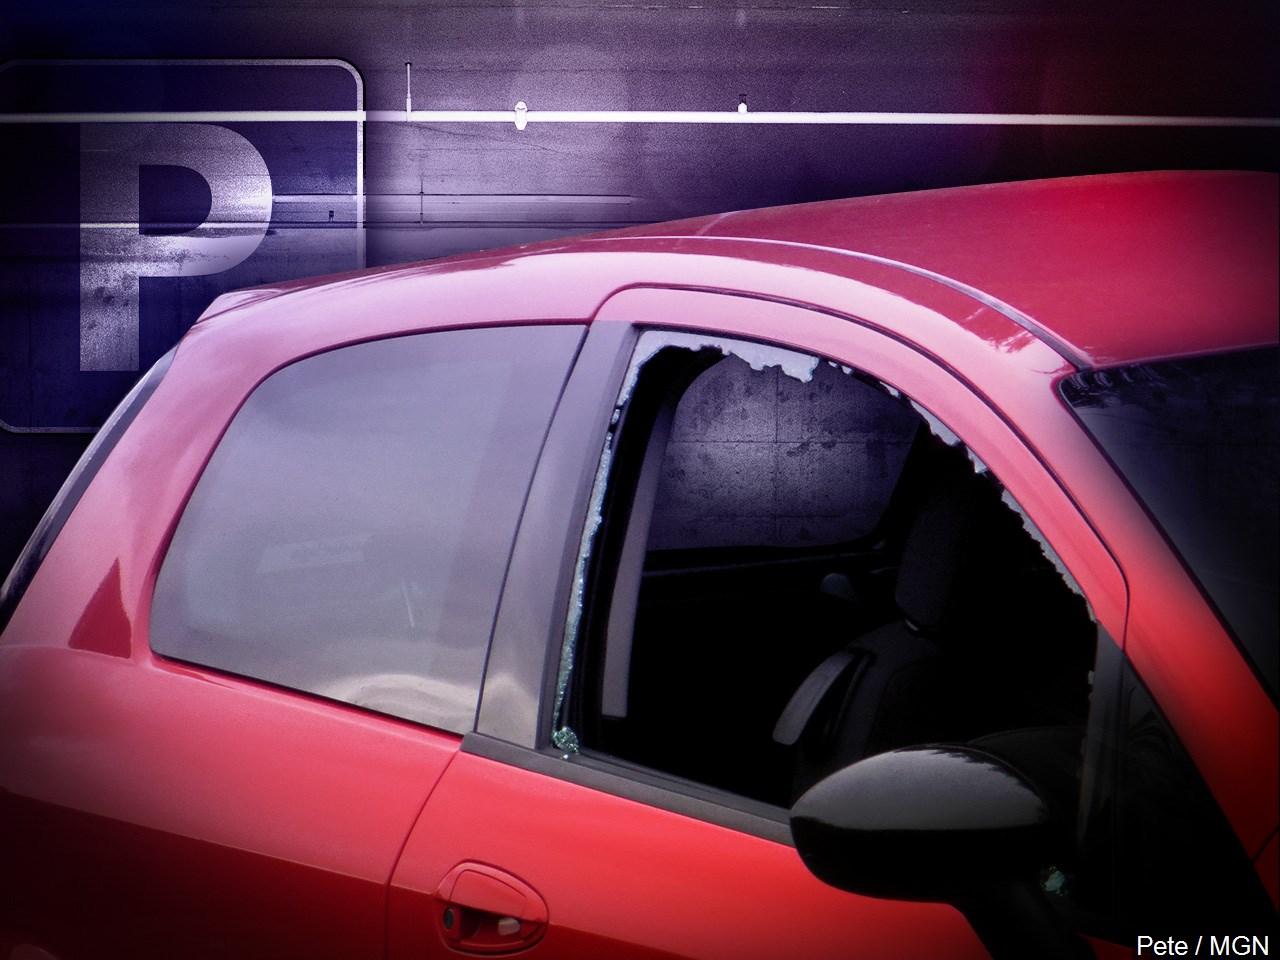 CAR BREAK INS_1504231472610.jpg